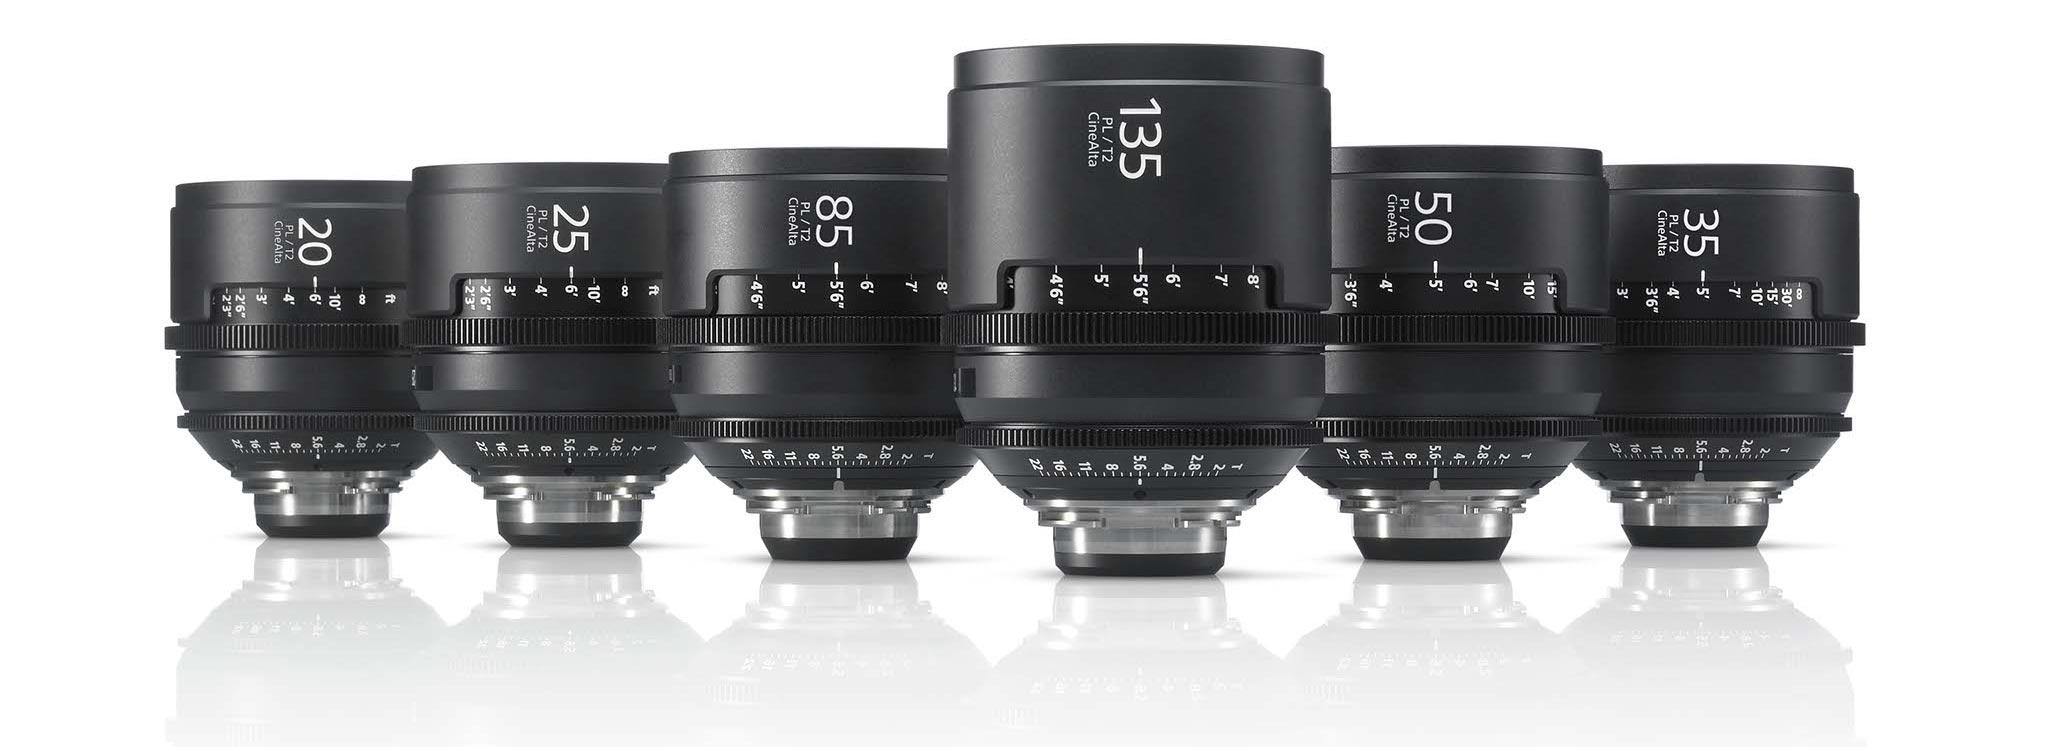 Sony CineAlta 4K Lens Seti (PL Mount) Image